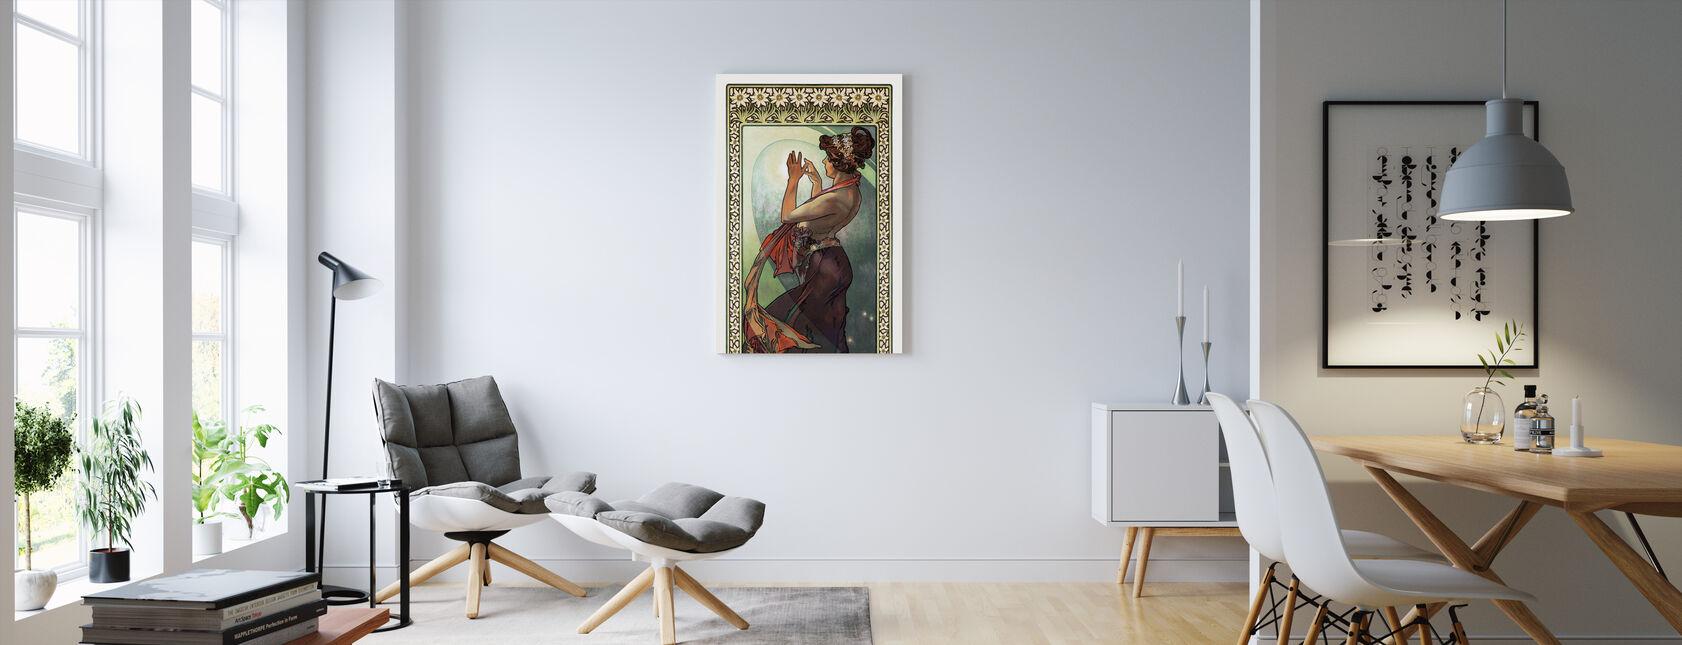 Alphonse Mucha - Fleece Star - Canvas print - Living Room